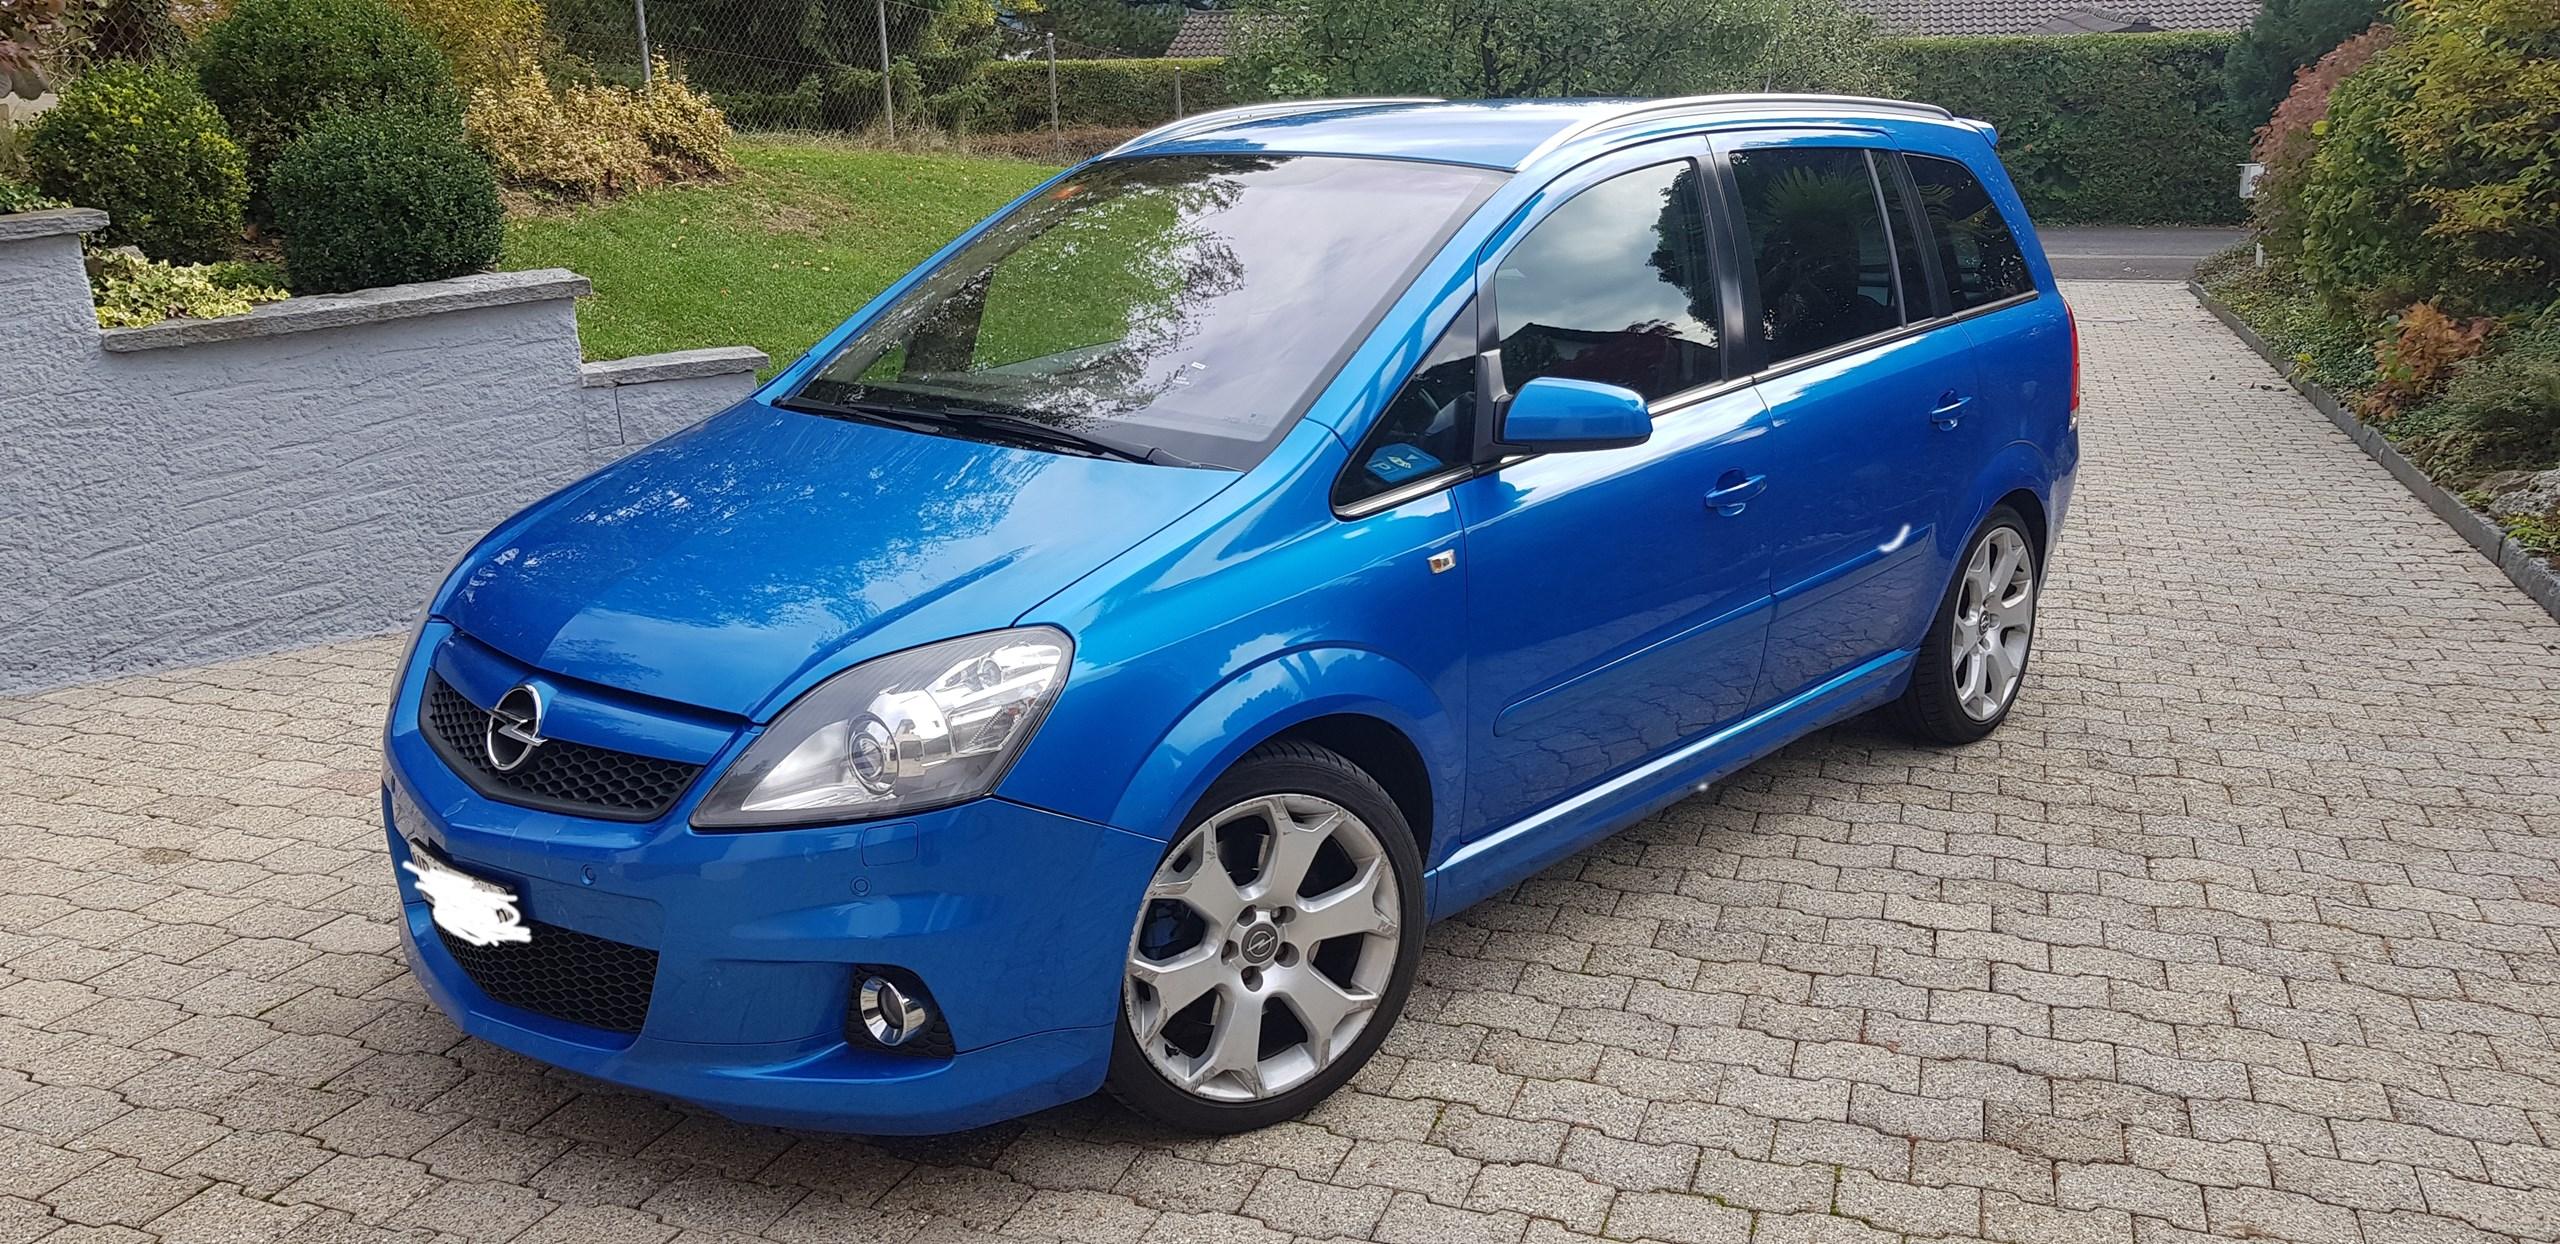 Opel Zafira 2.0 T OPC